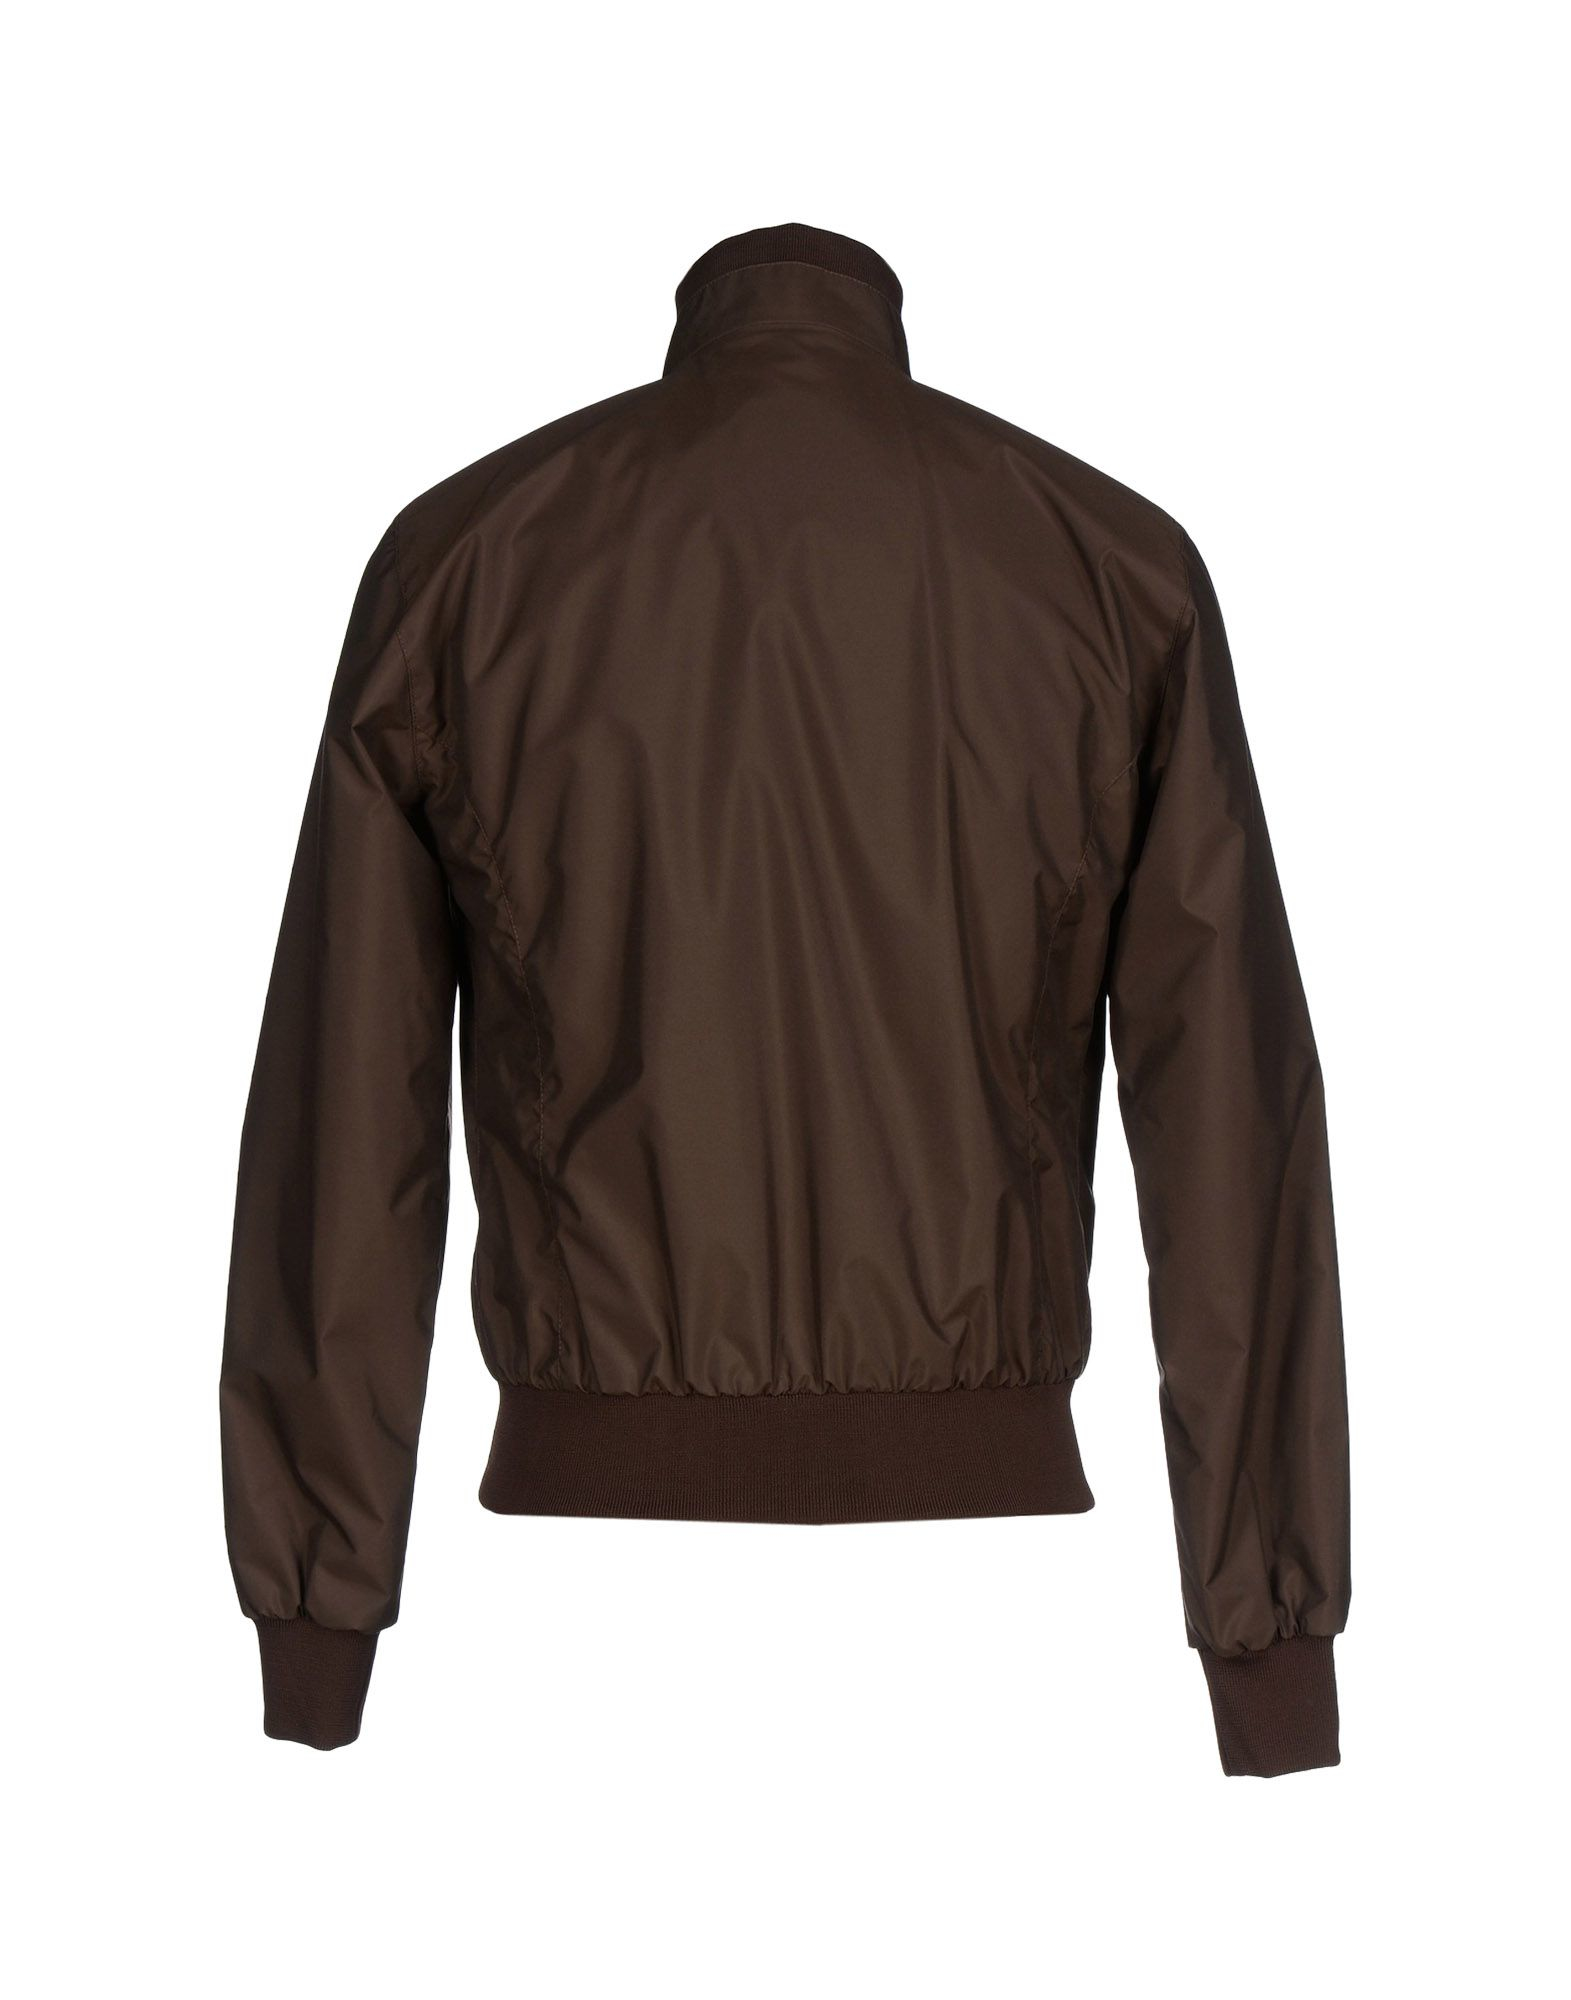 north sails jacket in multicolor for men cocoa lyst. Black Bedroom Furniture Sets. Home Design Ideas